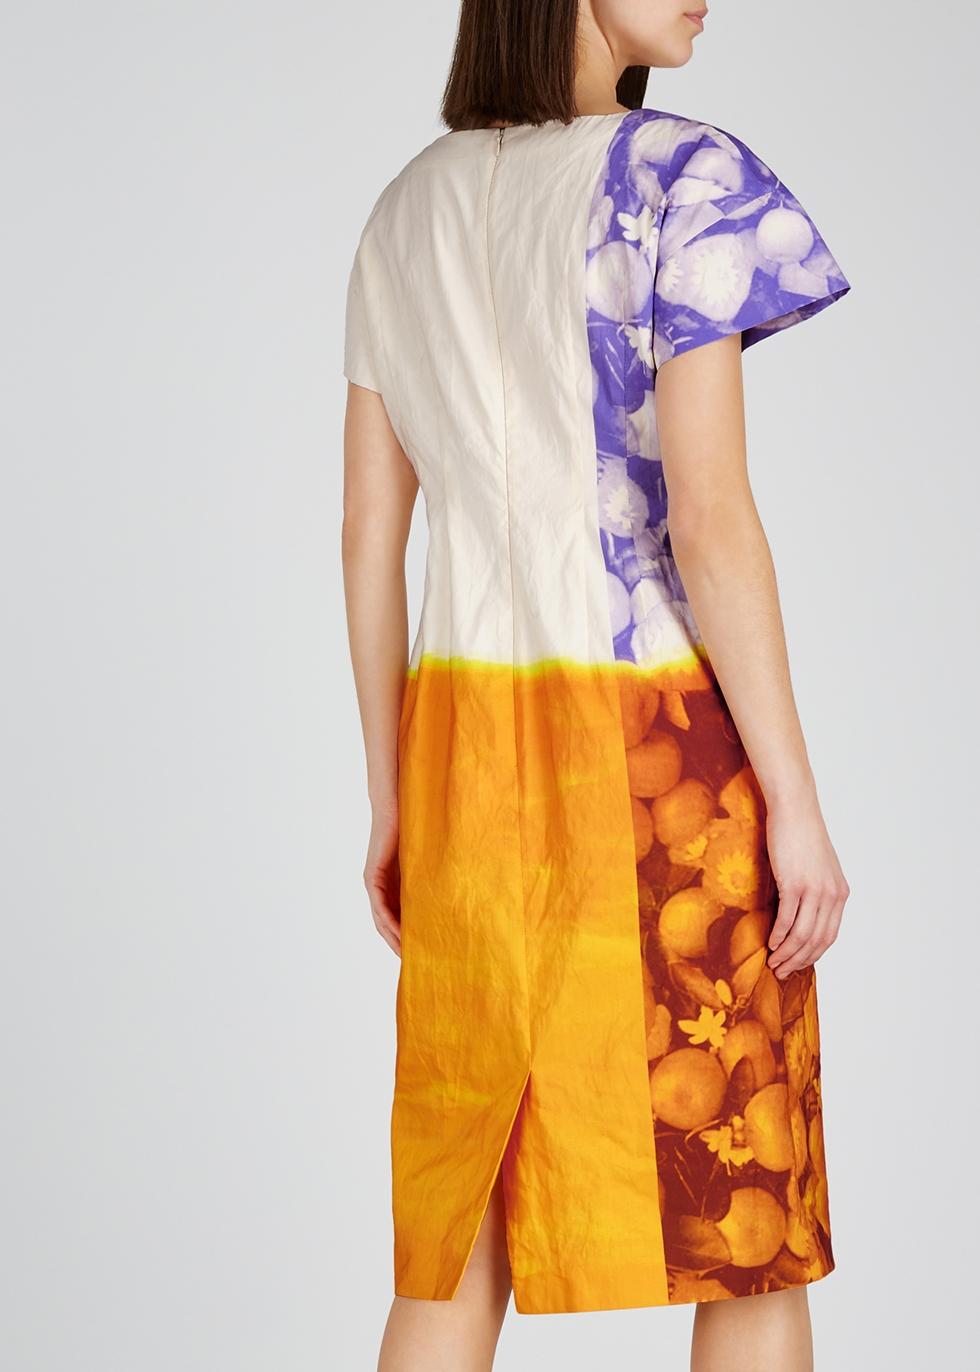 Della printed cotton-blend midi dress - Dries Van Noten